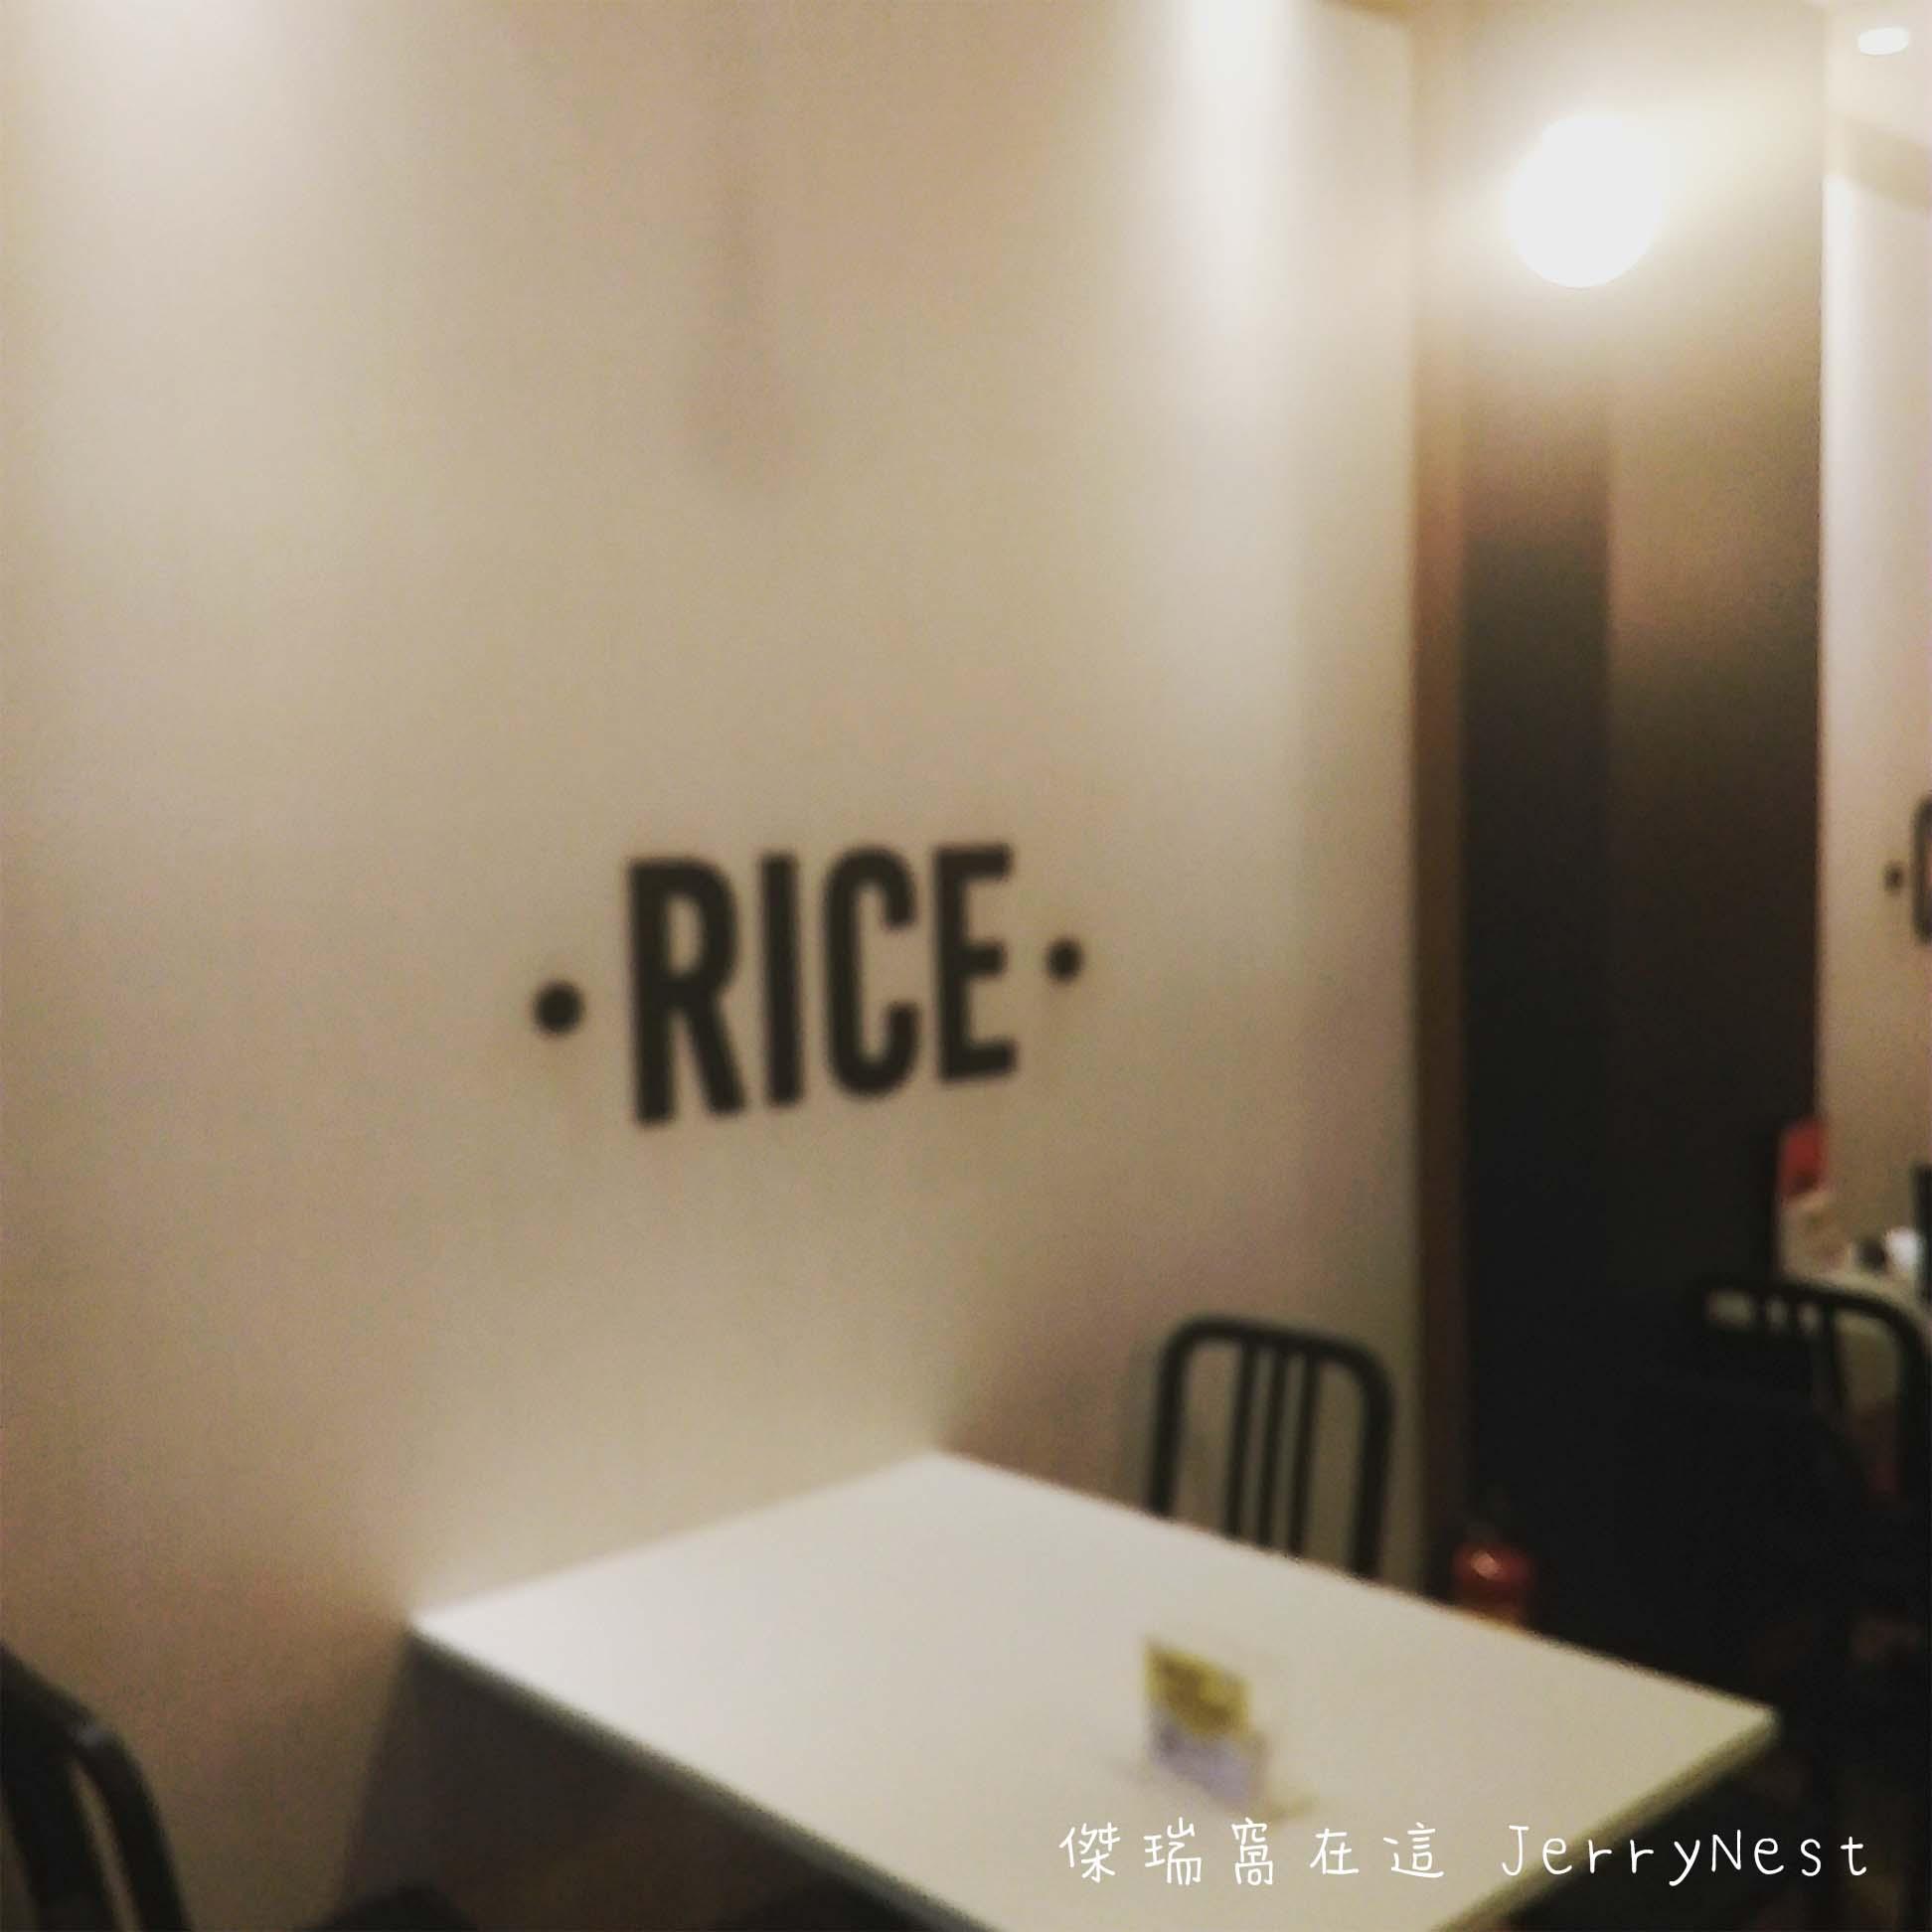 bb5 - 台北微風廣場|用碗喝飲料的亞洲特色餐廳 碗宴 Bowl Room